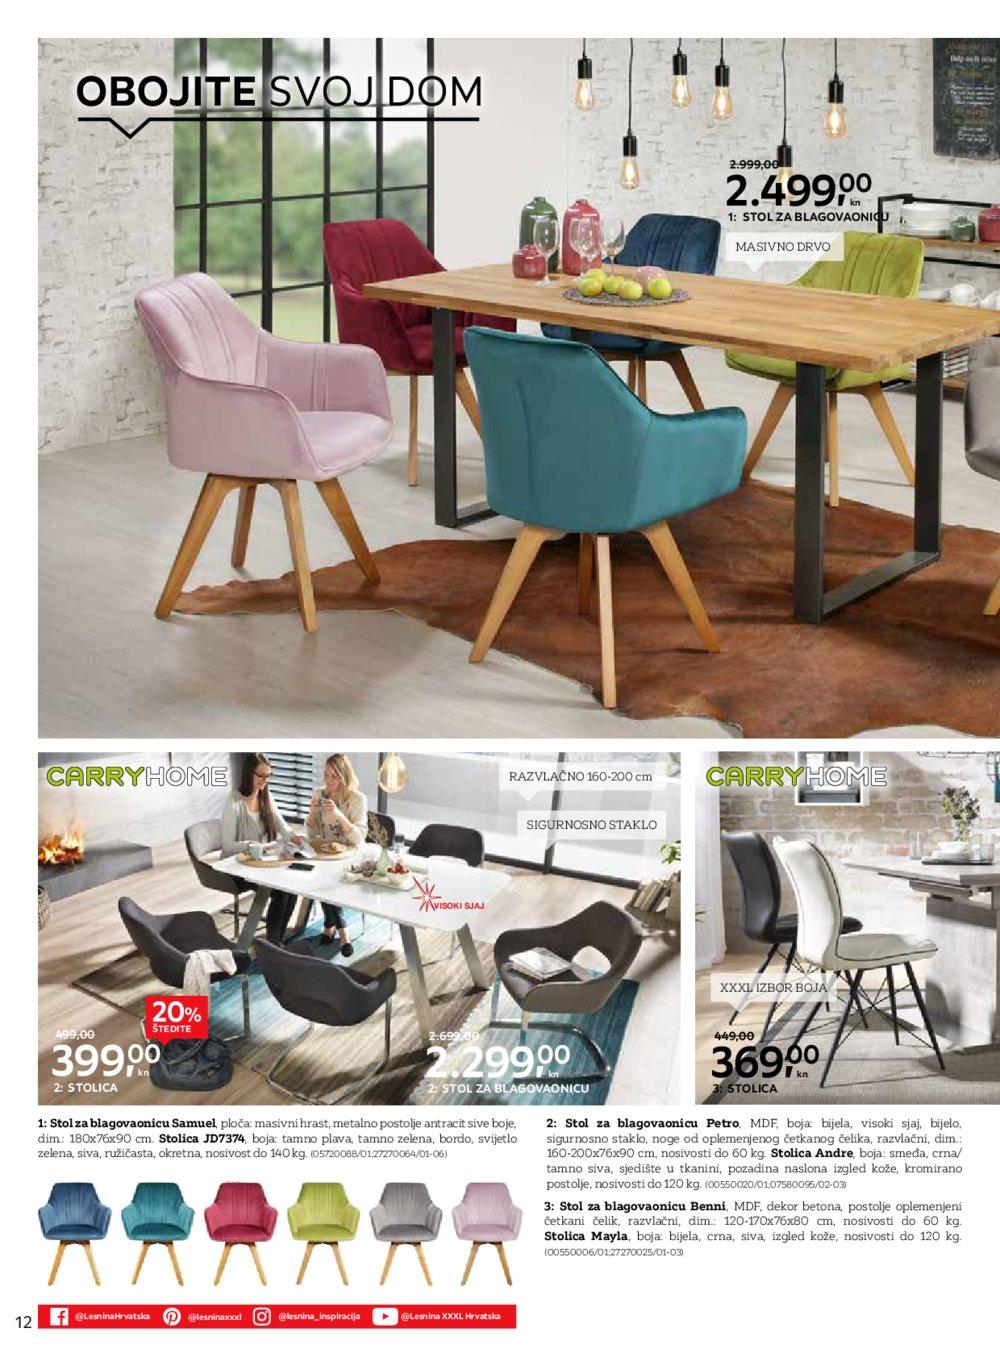 Lesnina katalog Kreirajmo dom zajedno Zg west Zg east Pu 01.10.-16.10.2019.